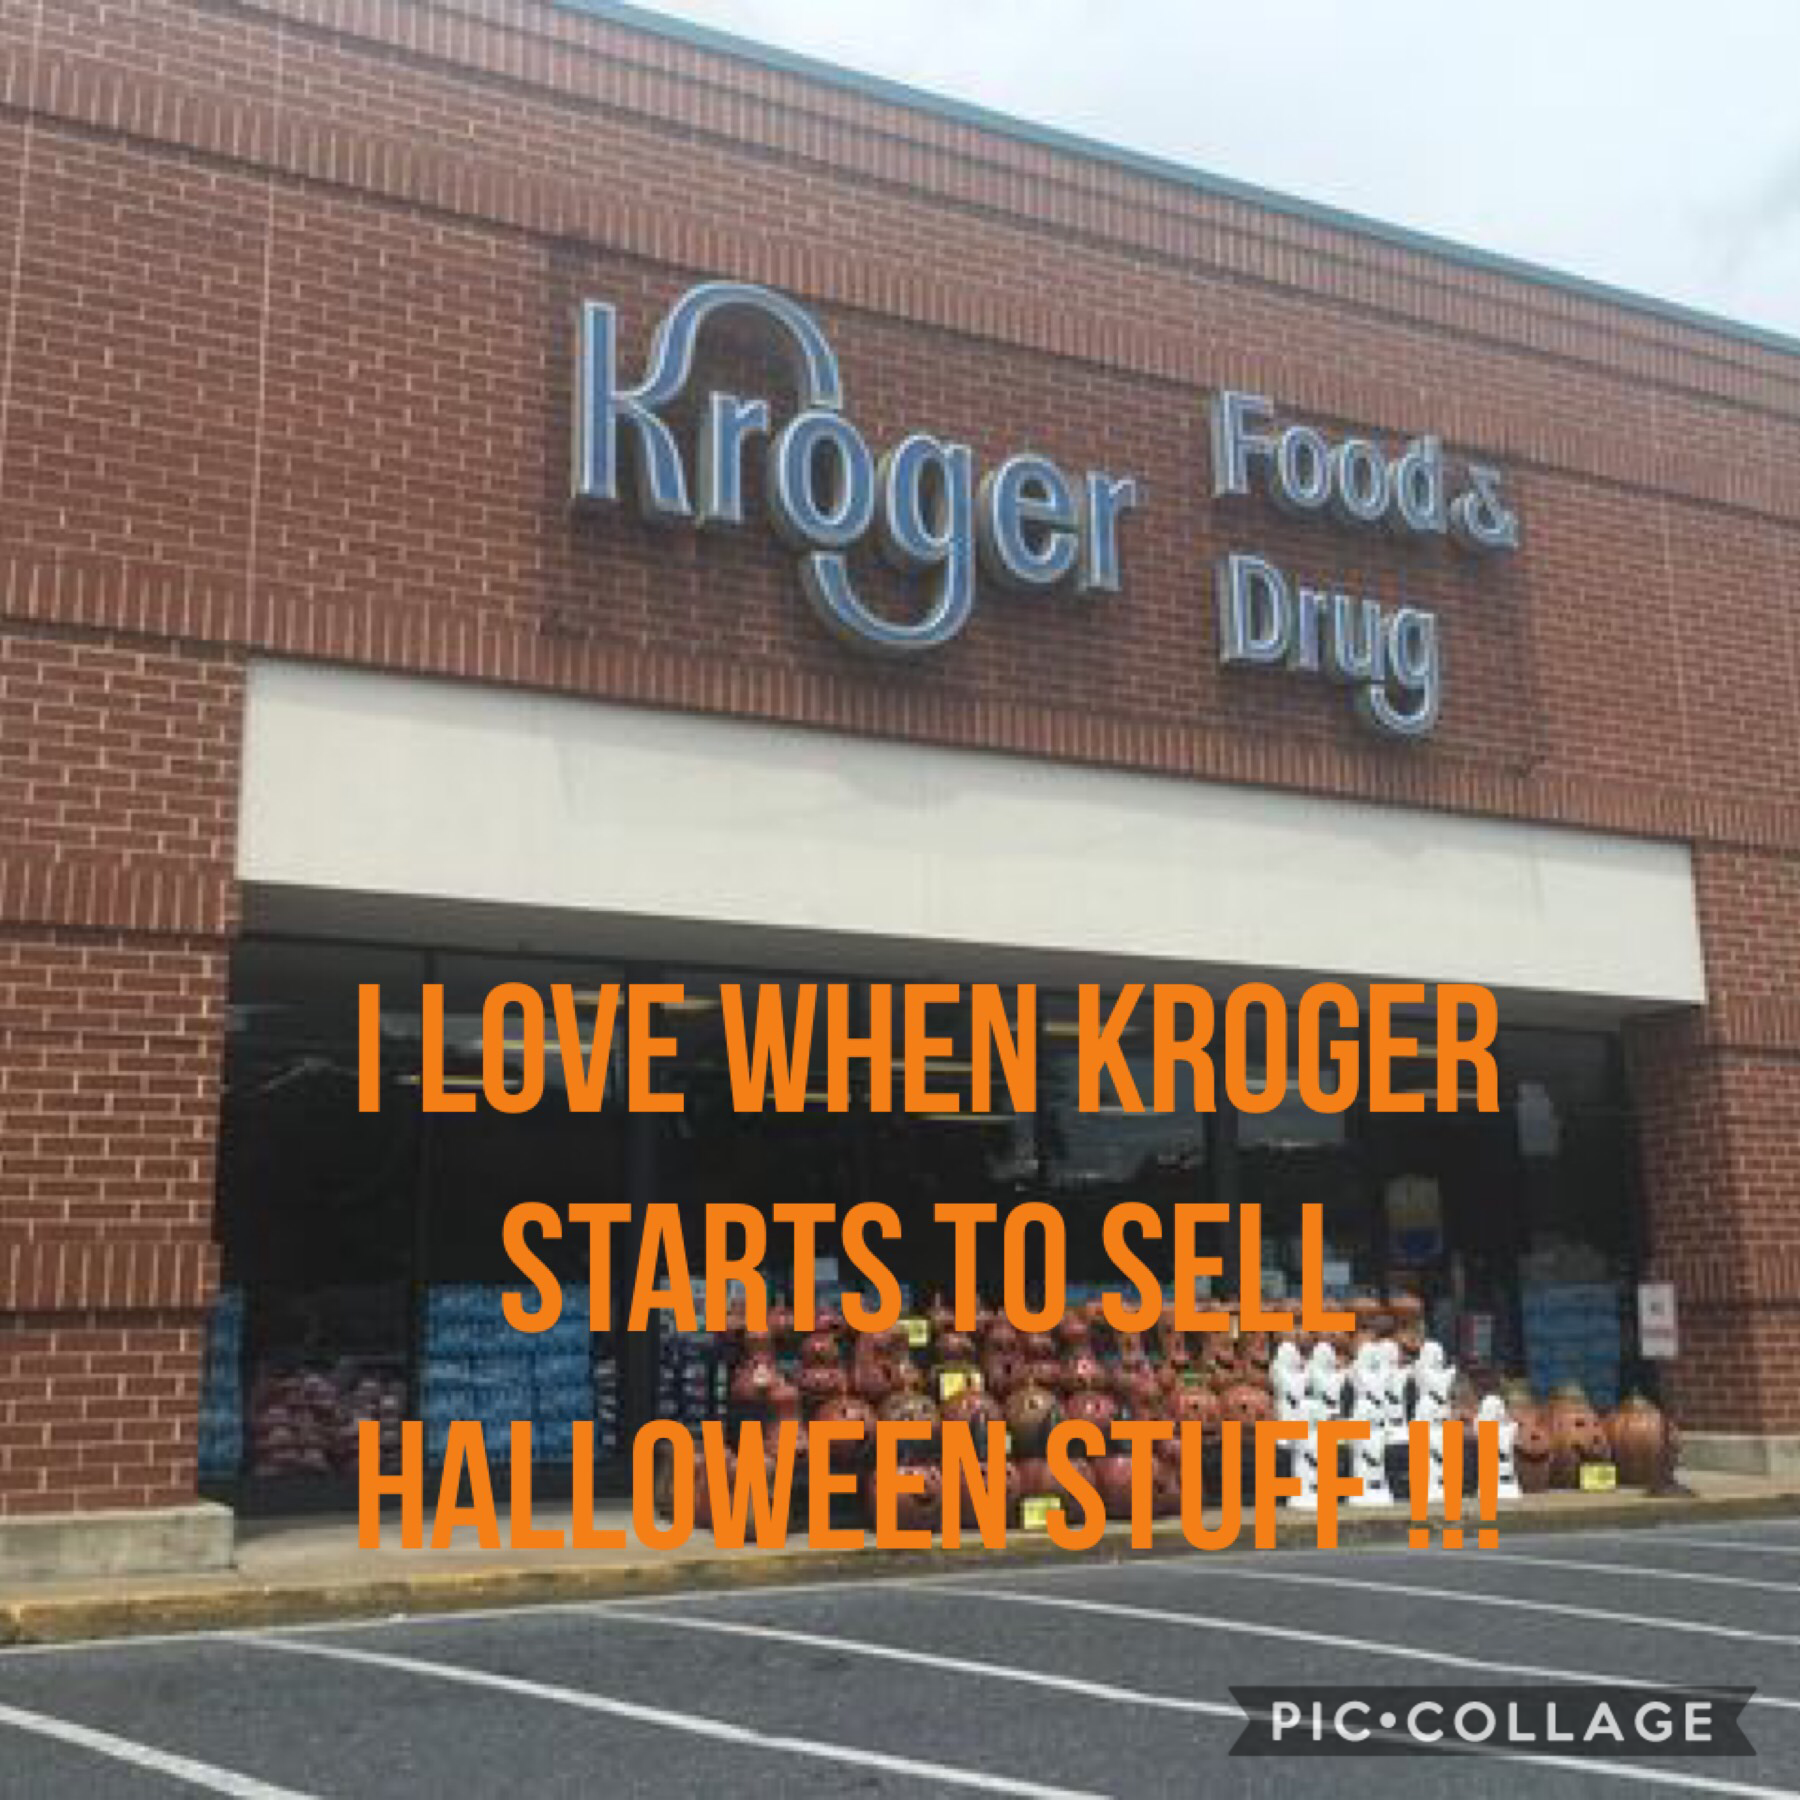 I love Kroger @ Halloween time 🎃